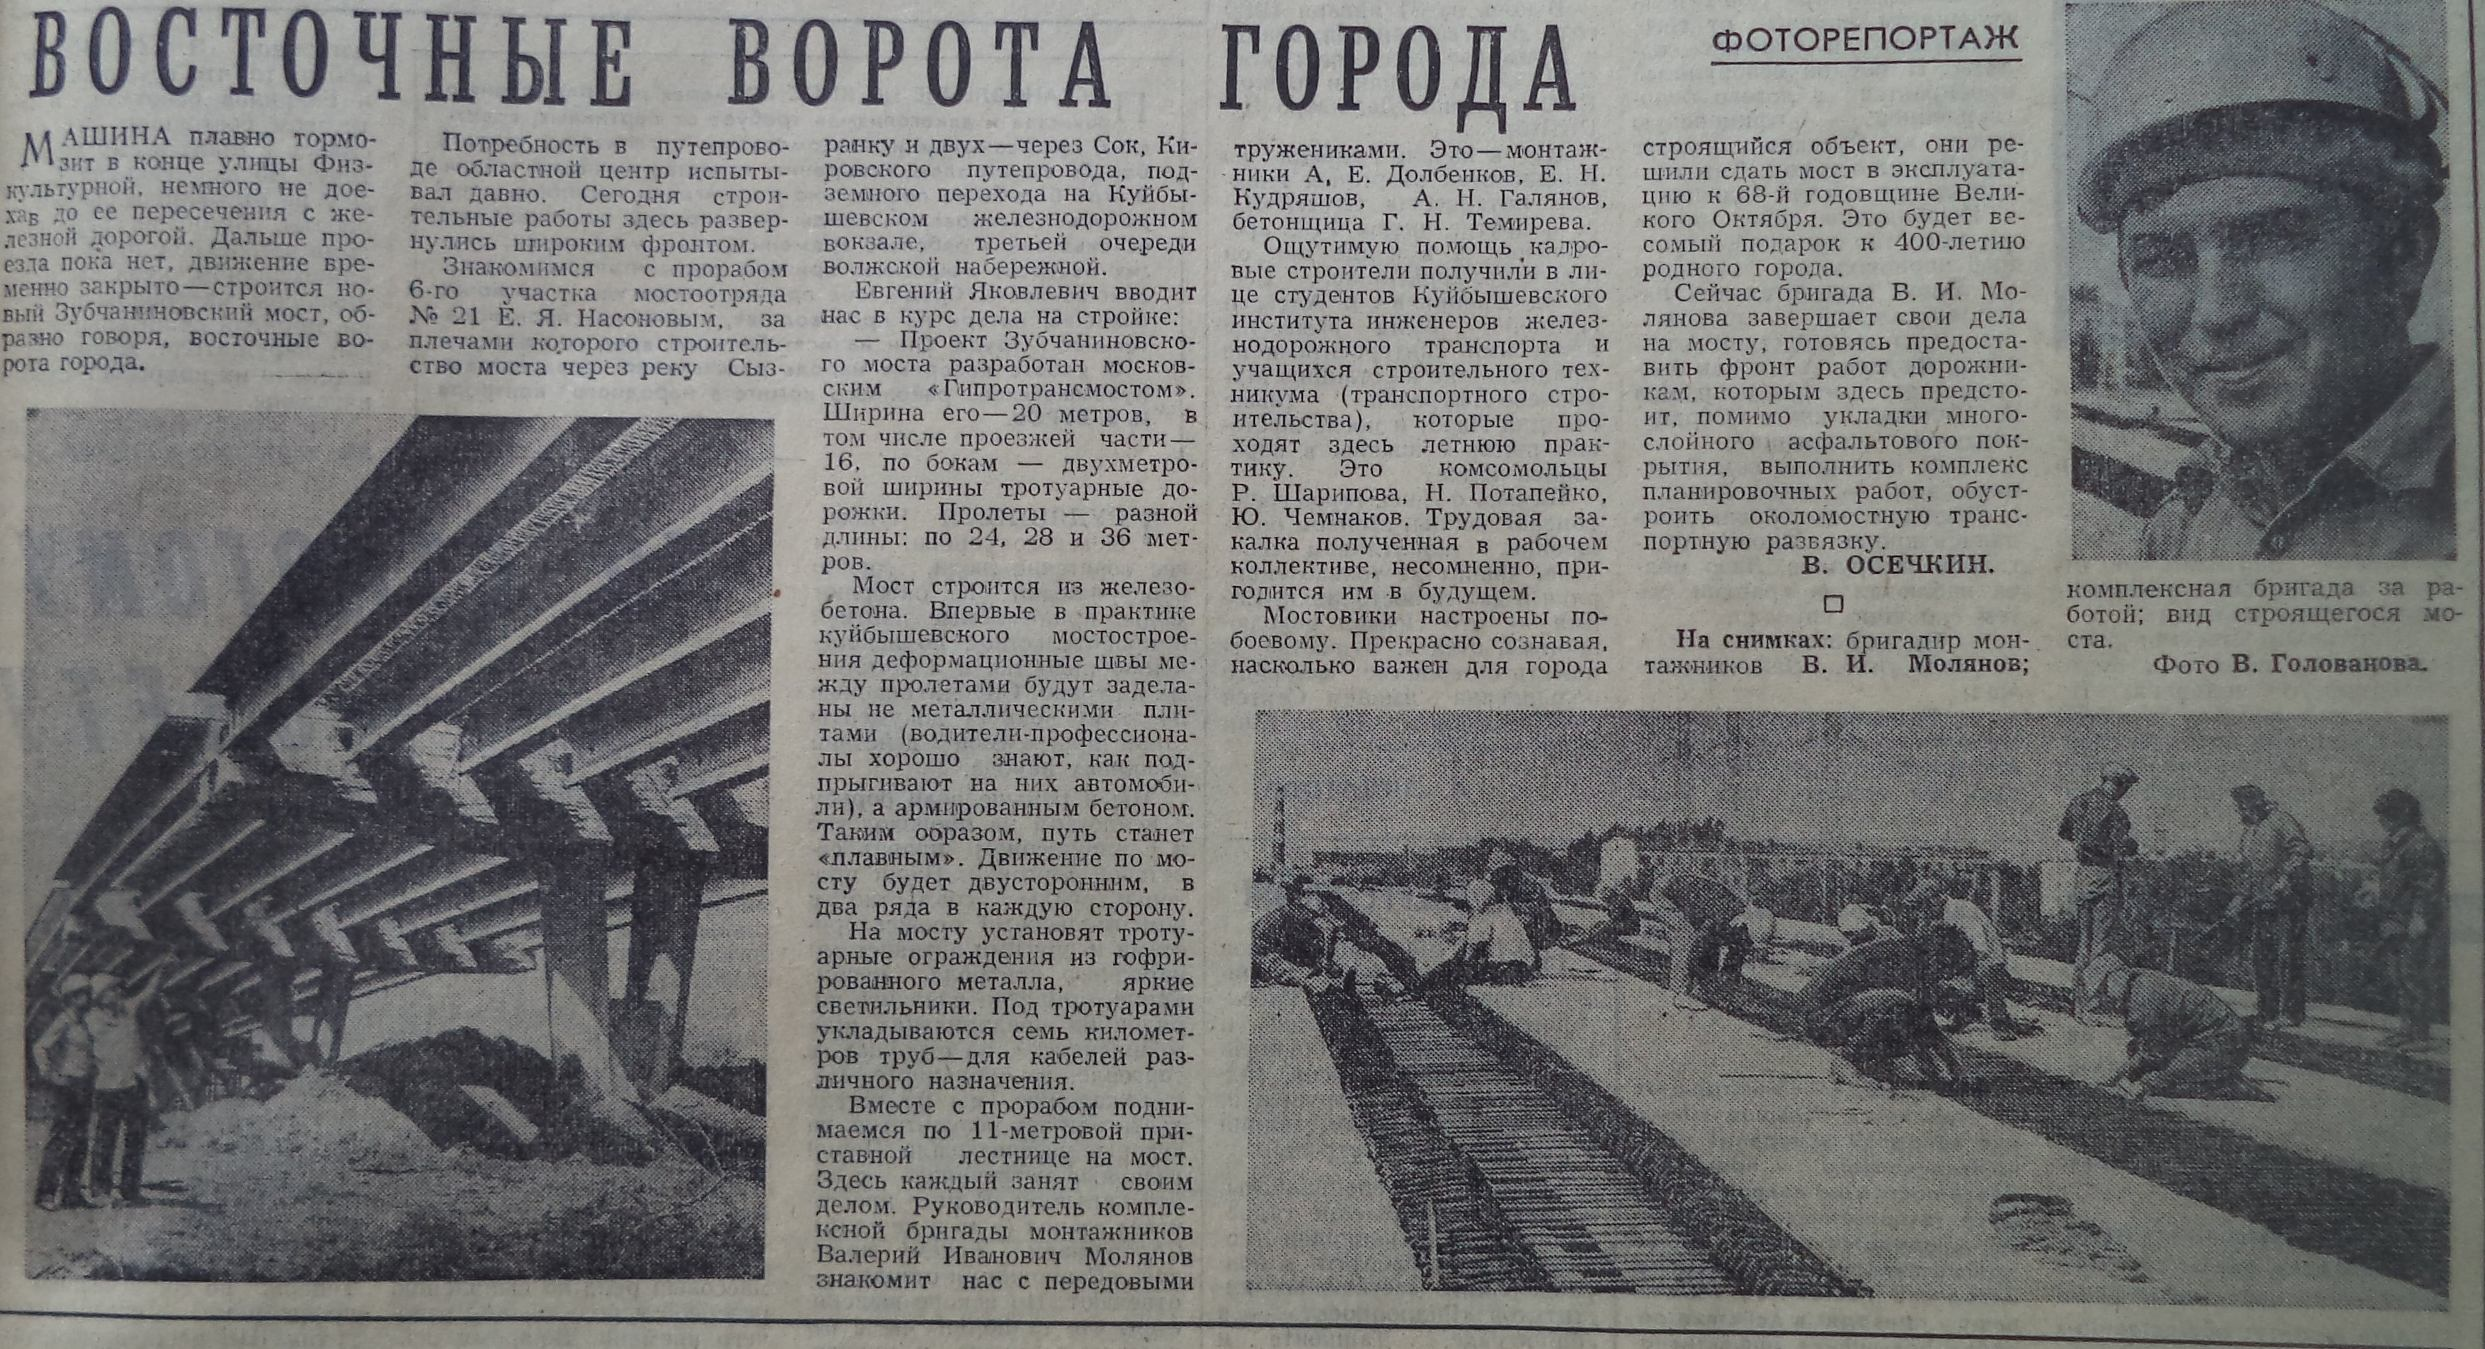 Физкультурная-ФОТО-82-ВЗя-1985-07-11-стр-во путепровода на Физк-min